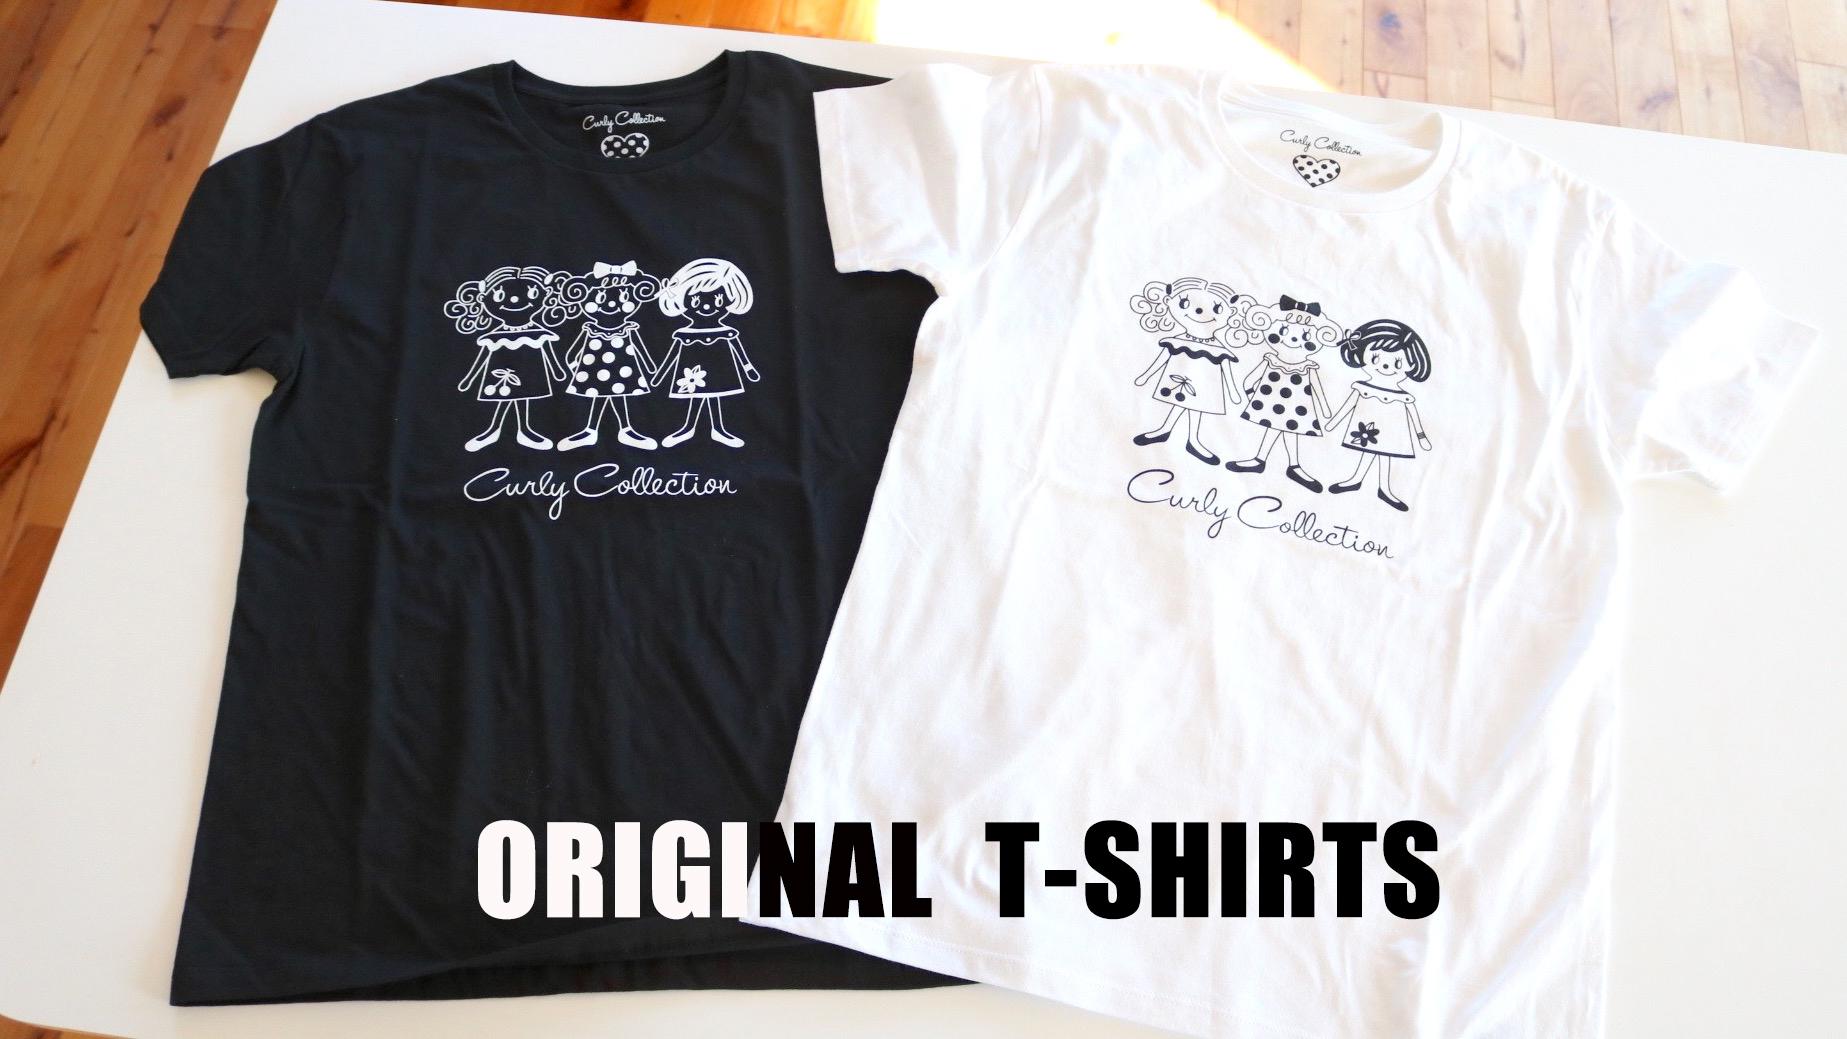 t0shirts